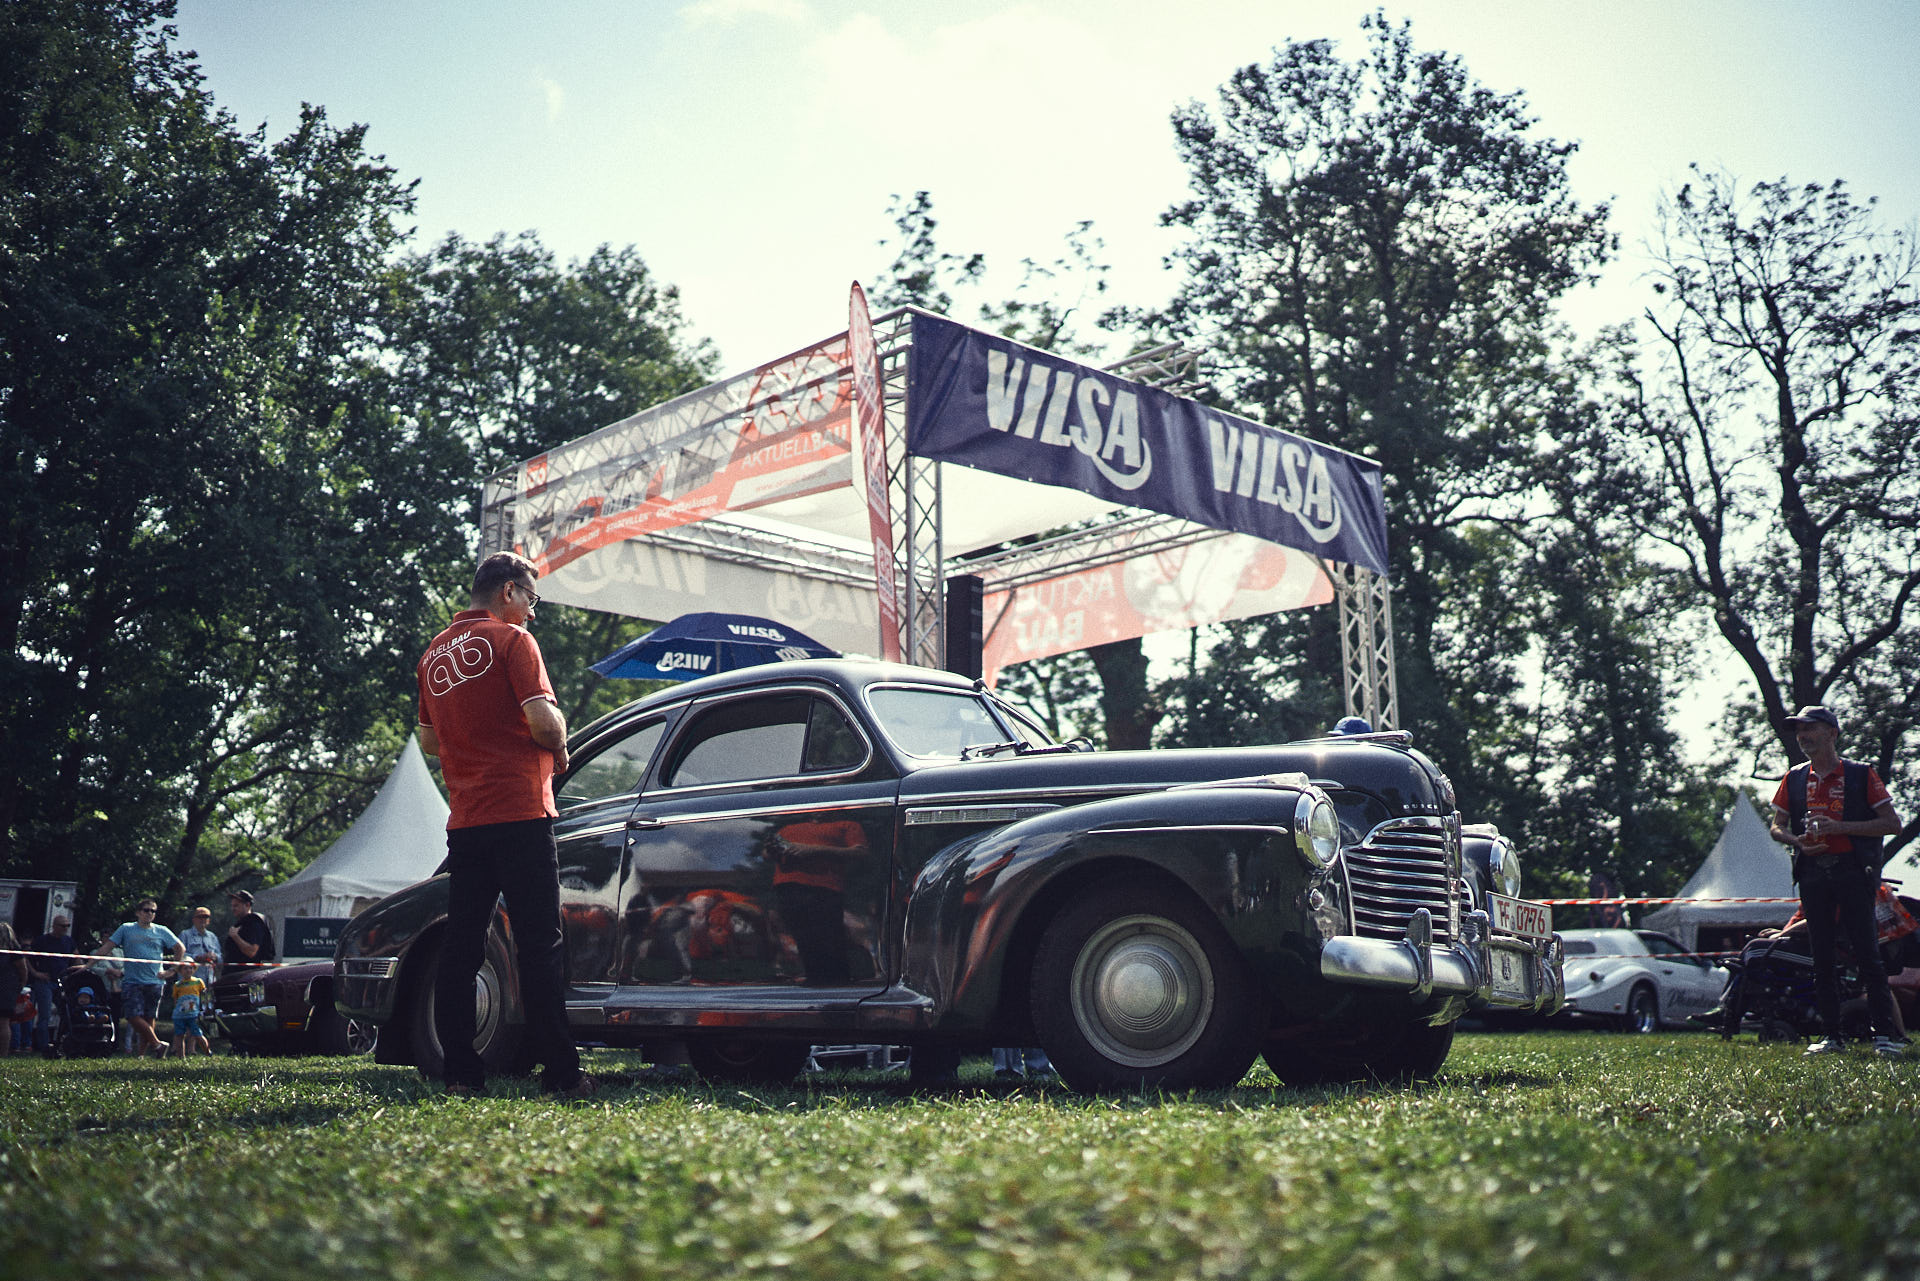 US Car Classics Diedersdorf uscarsgermany kramm us cars classic diedersdorf1